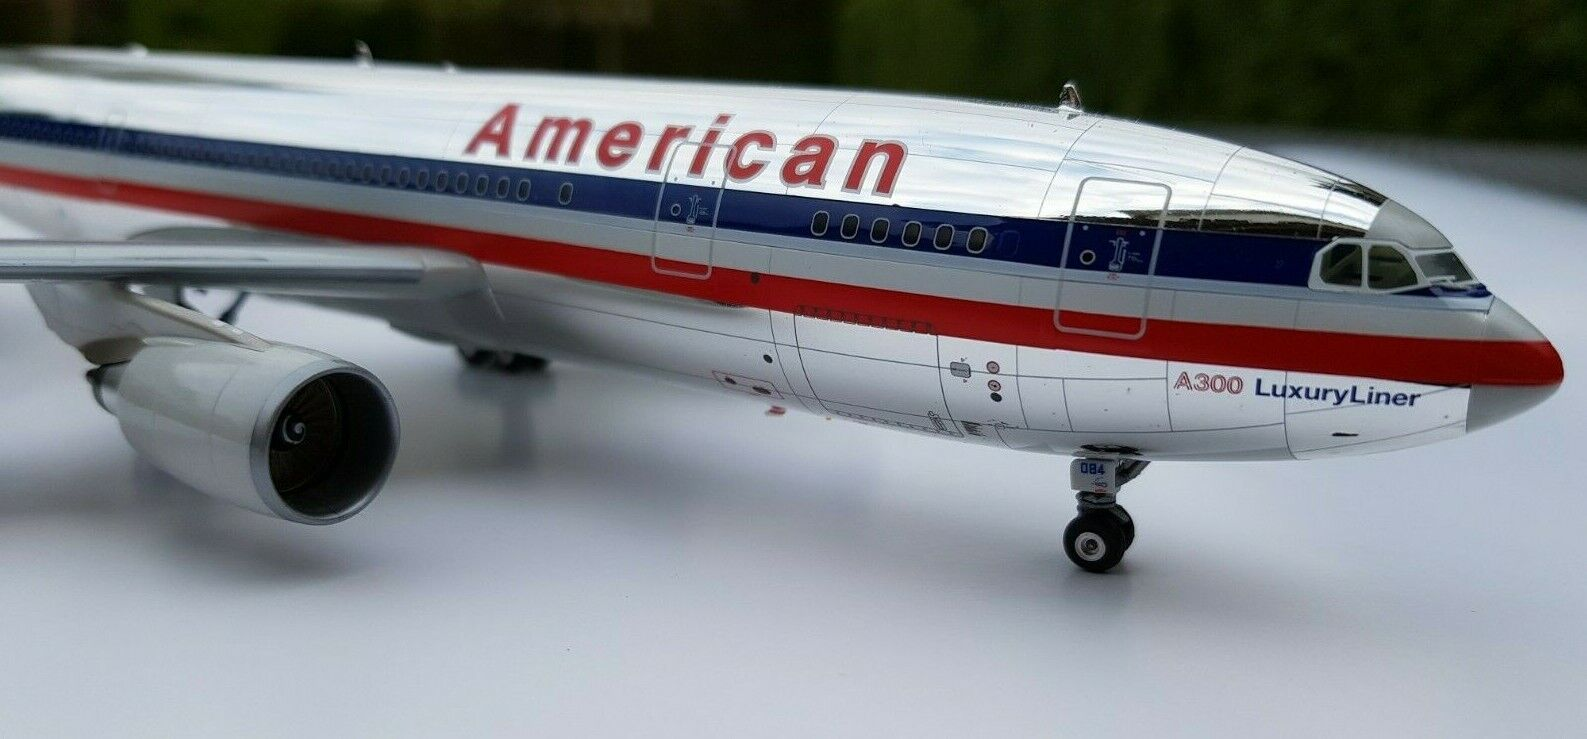 Herpa premium 1 200 american airlines airbus a300-600 súper Rare 016353 Top